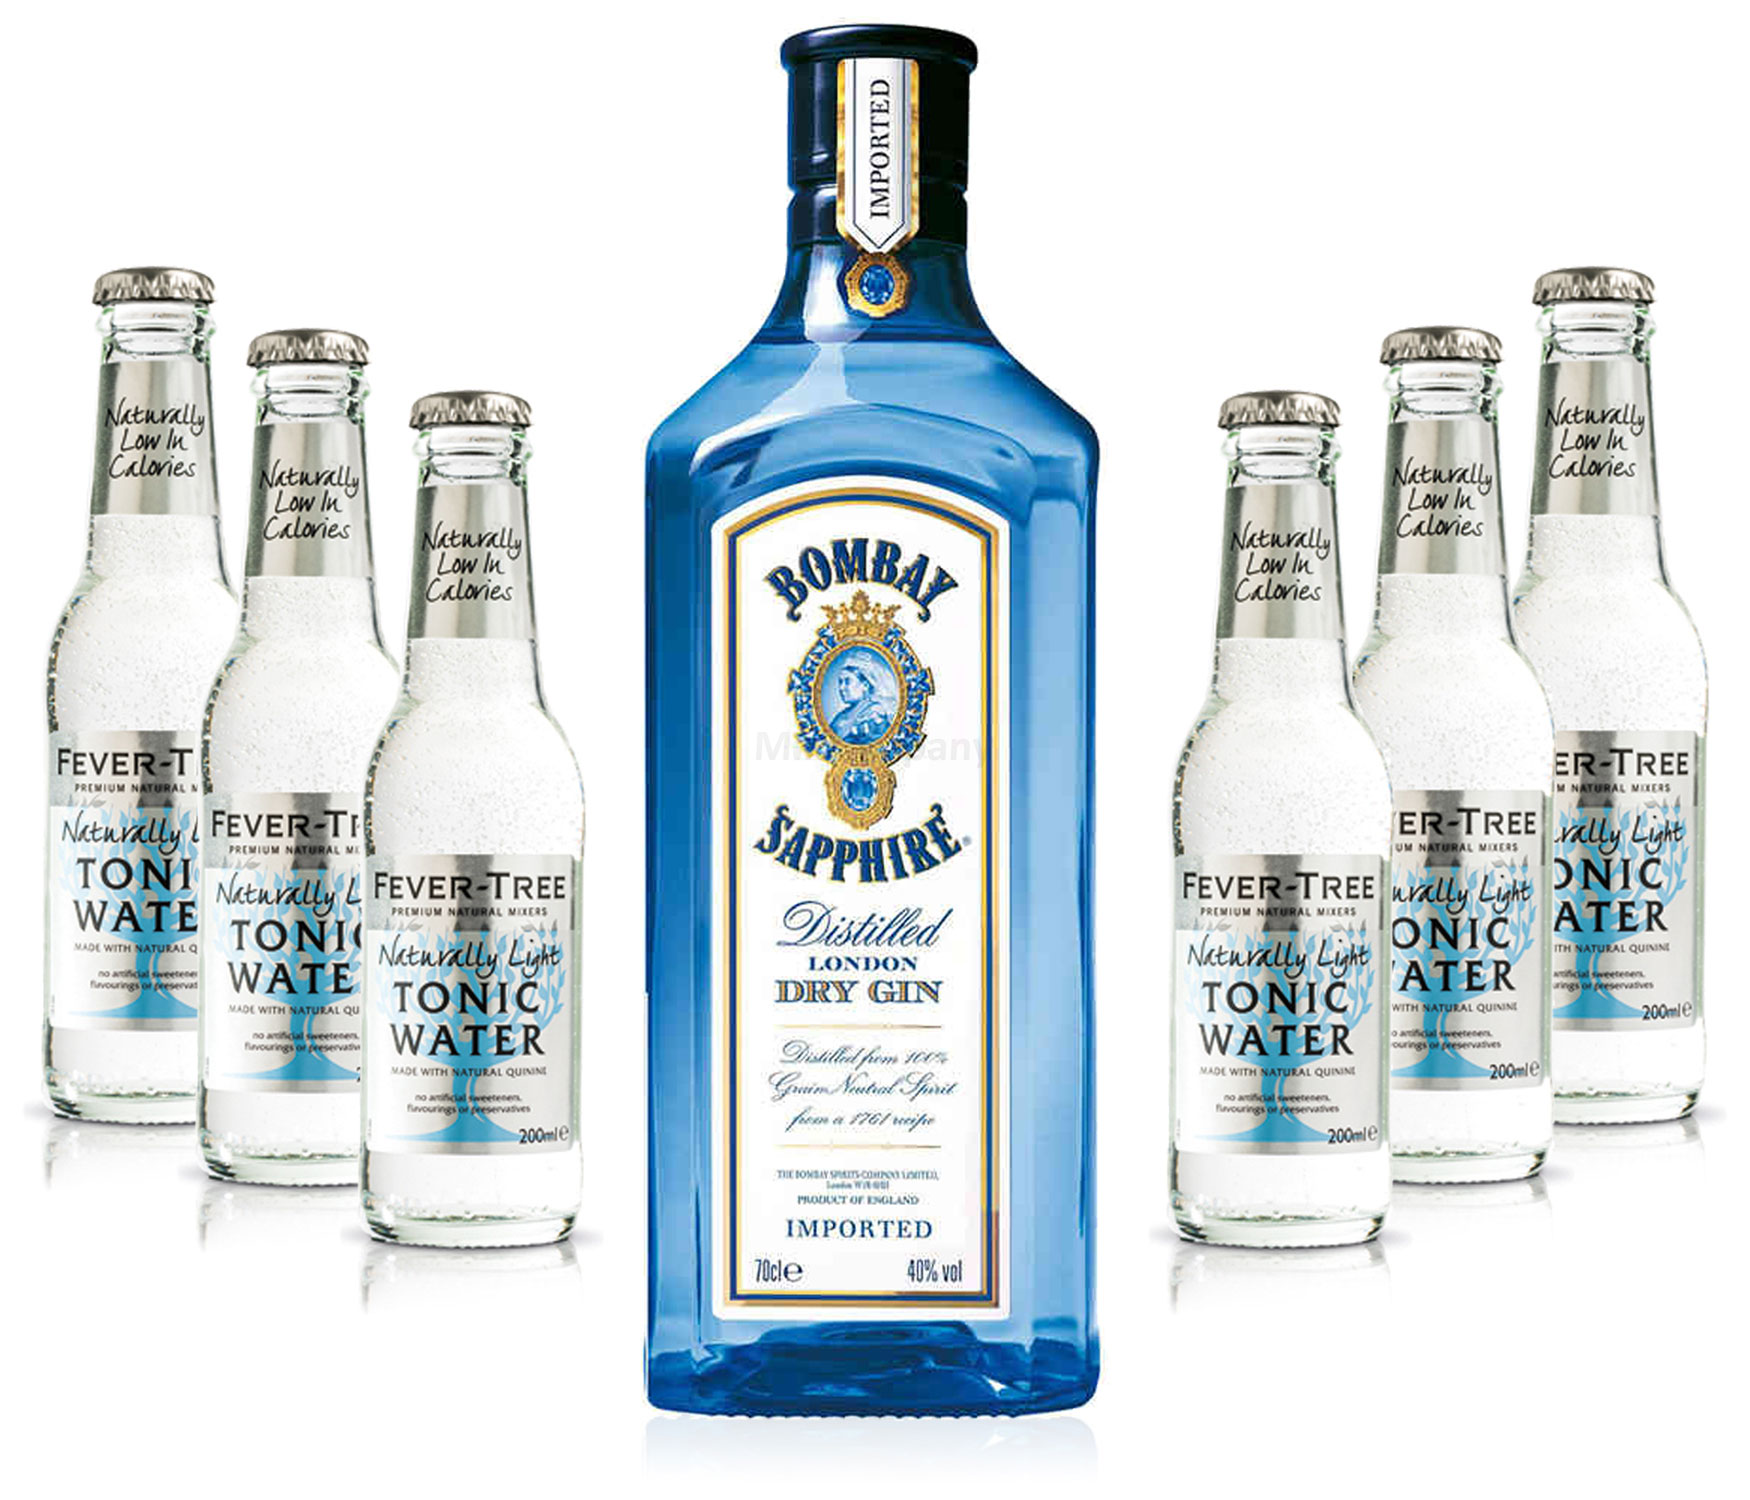 Gin Tonic Set - Bombay Sapphire 0,7l 700ml (40% Vol) + 6x Fever Tree Naturally Light Tonic Water 200ml - Inkl. Pfand MEHRWEG